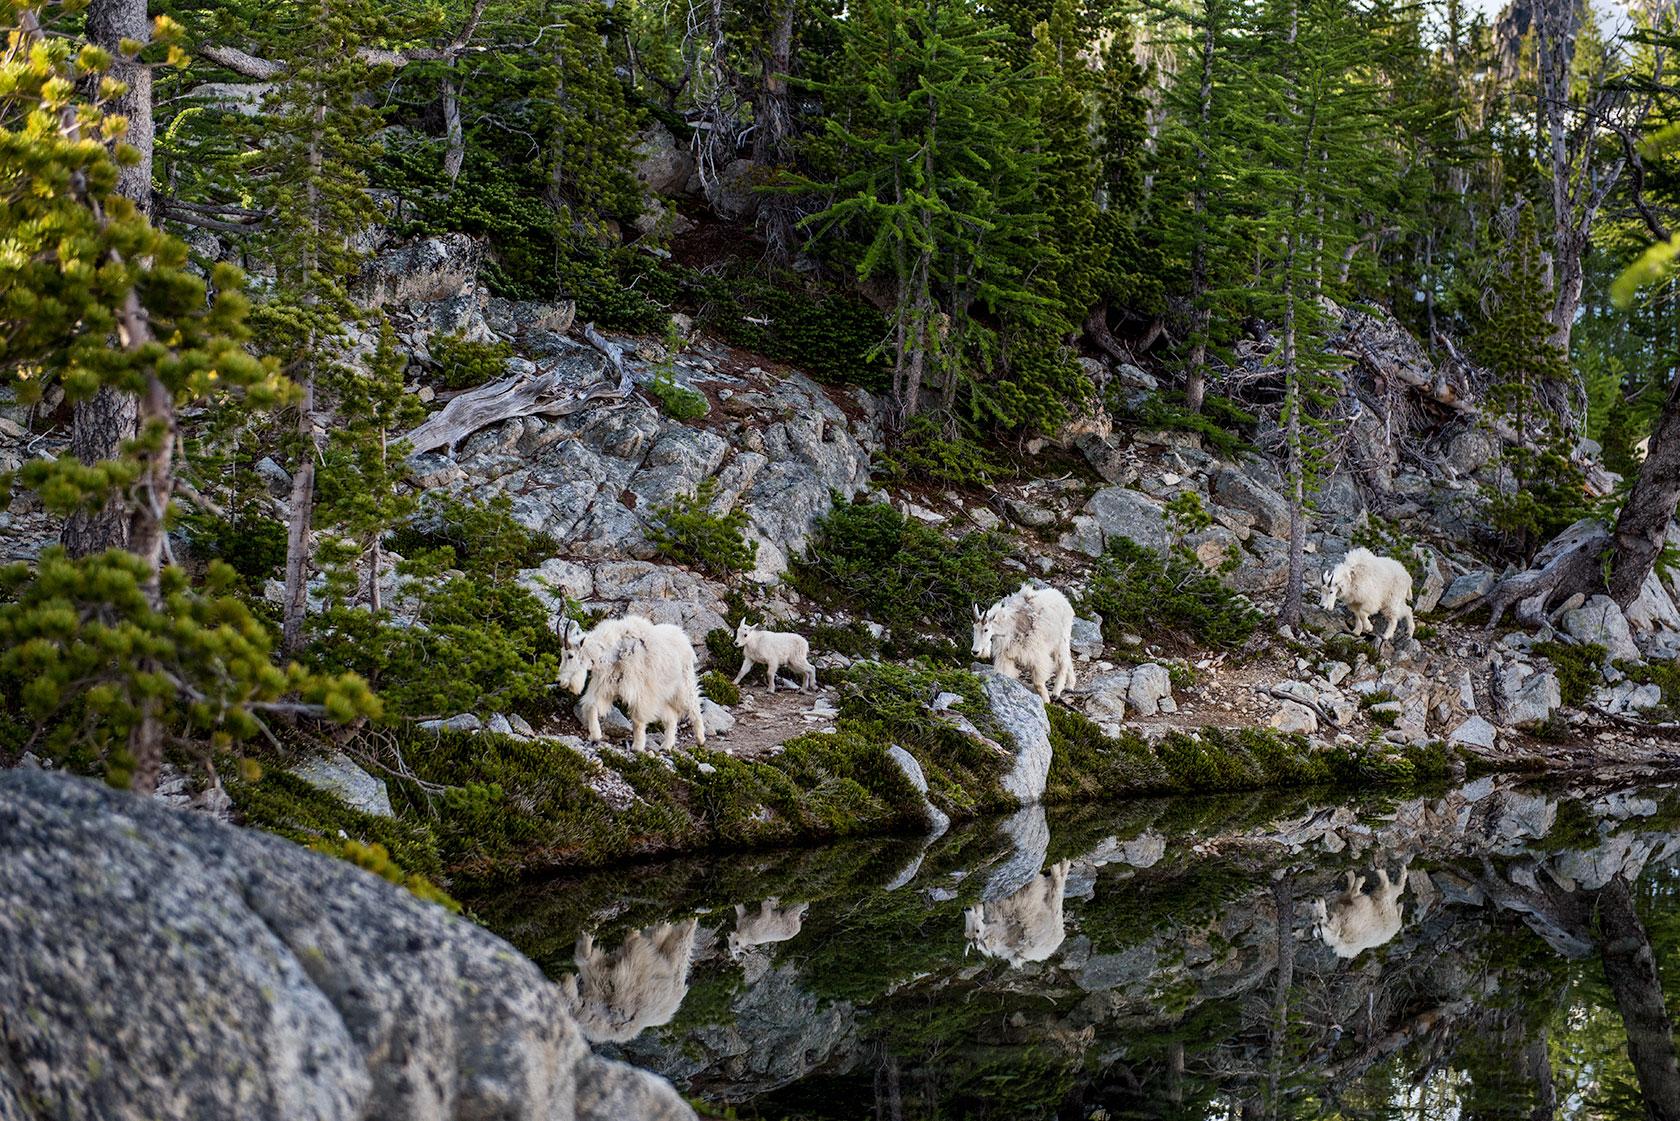 austin-trigg-osprey-hiking-backpacks-mountain-goat-washington-adventure-morning-outdoor-enchantments-.jpg